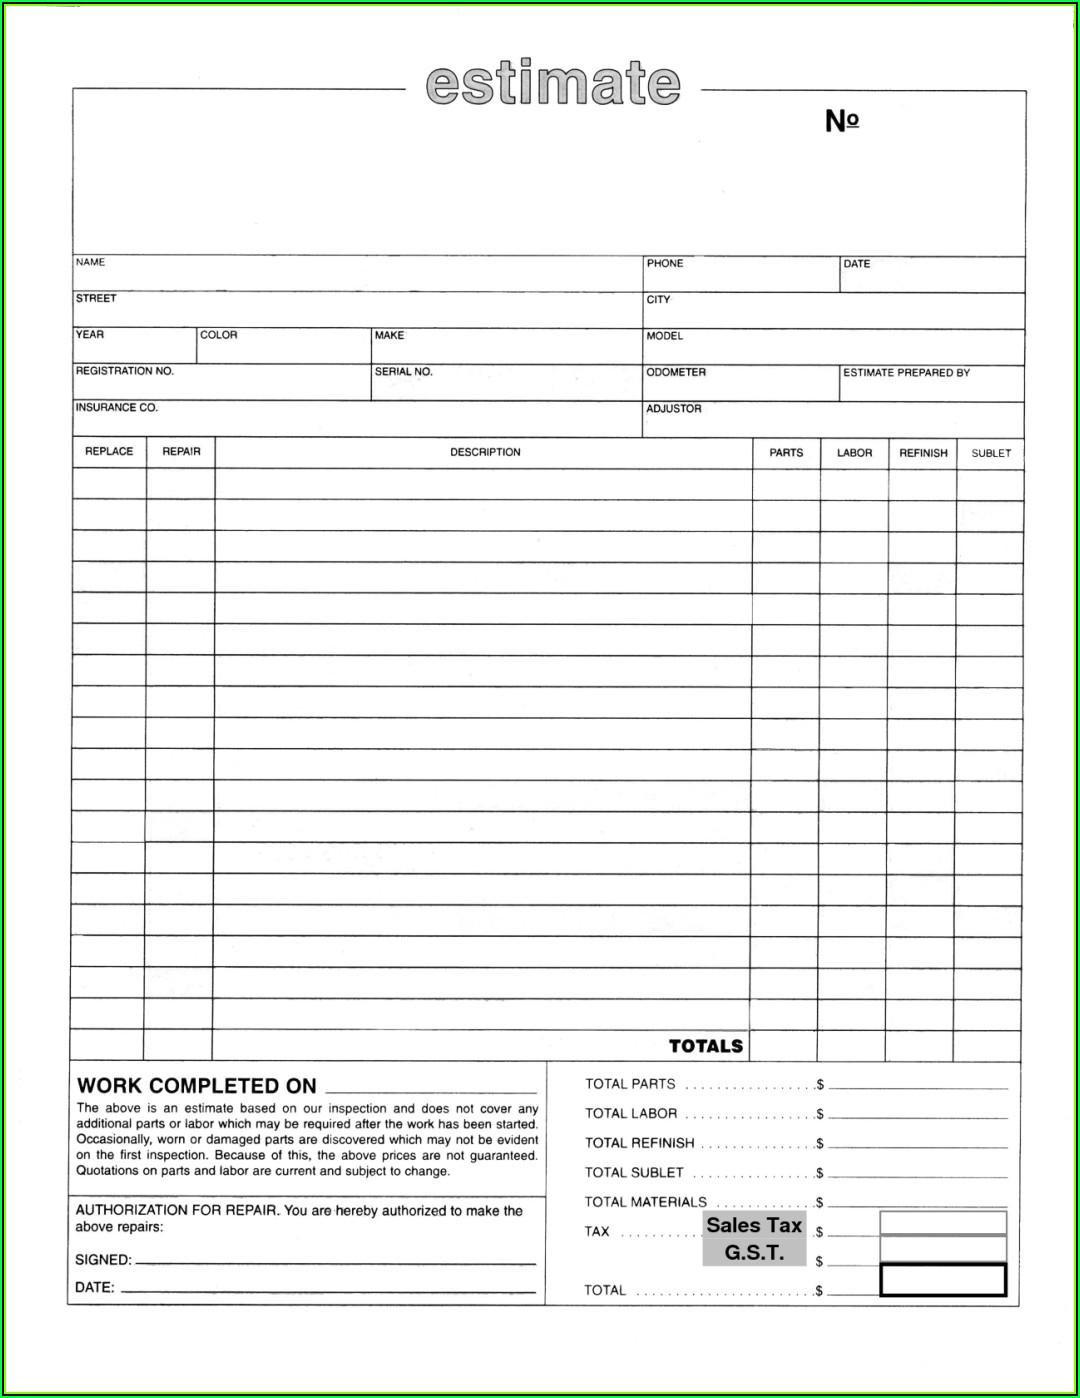 Auto Repair Estimate Forms Free Download